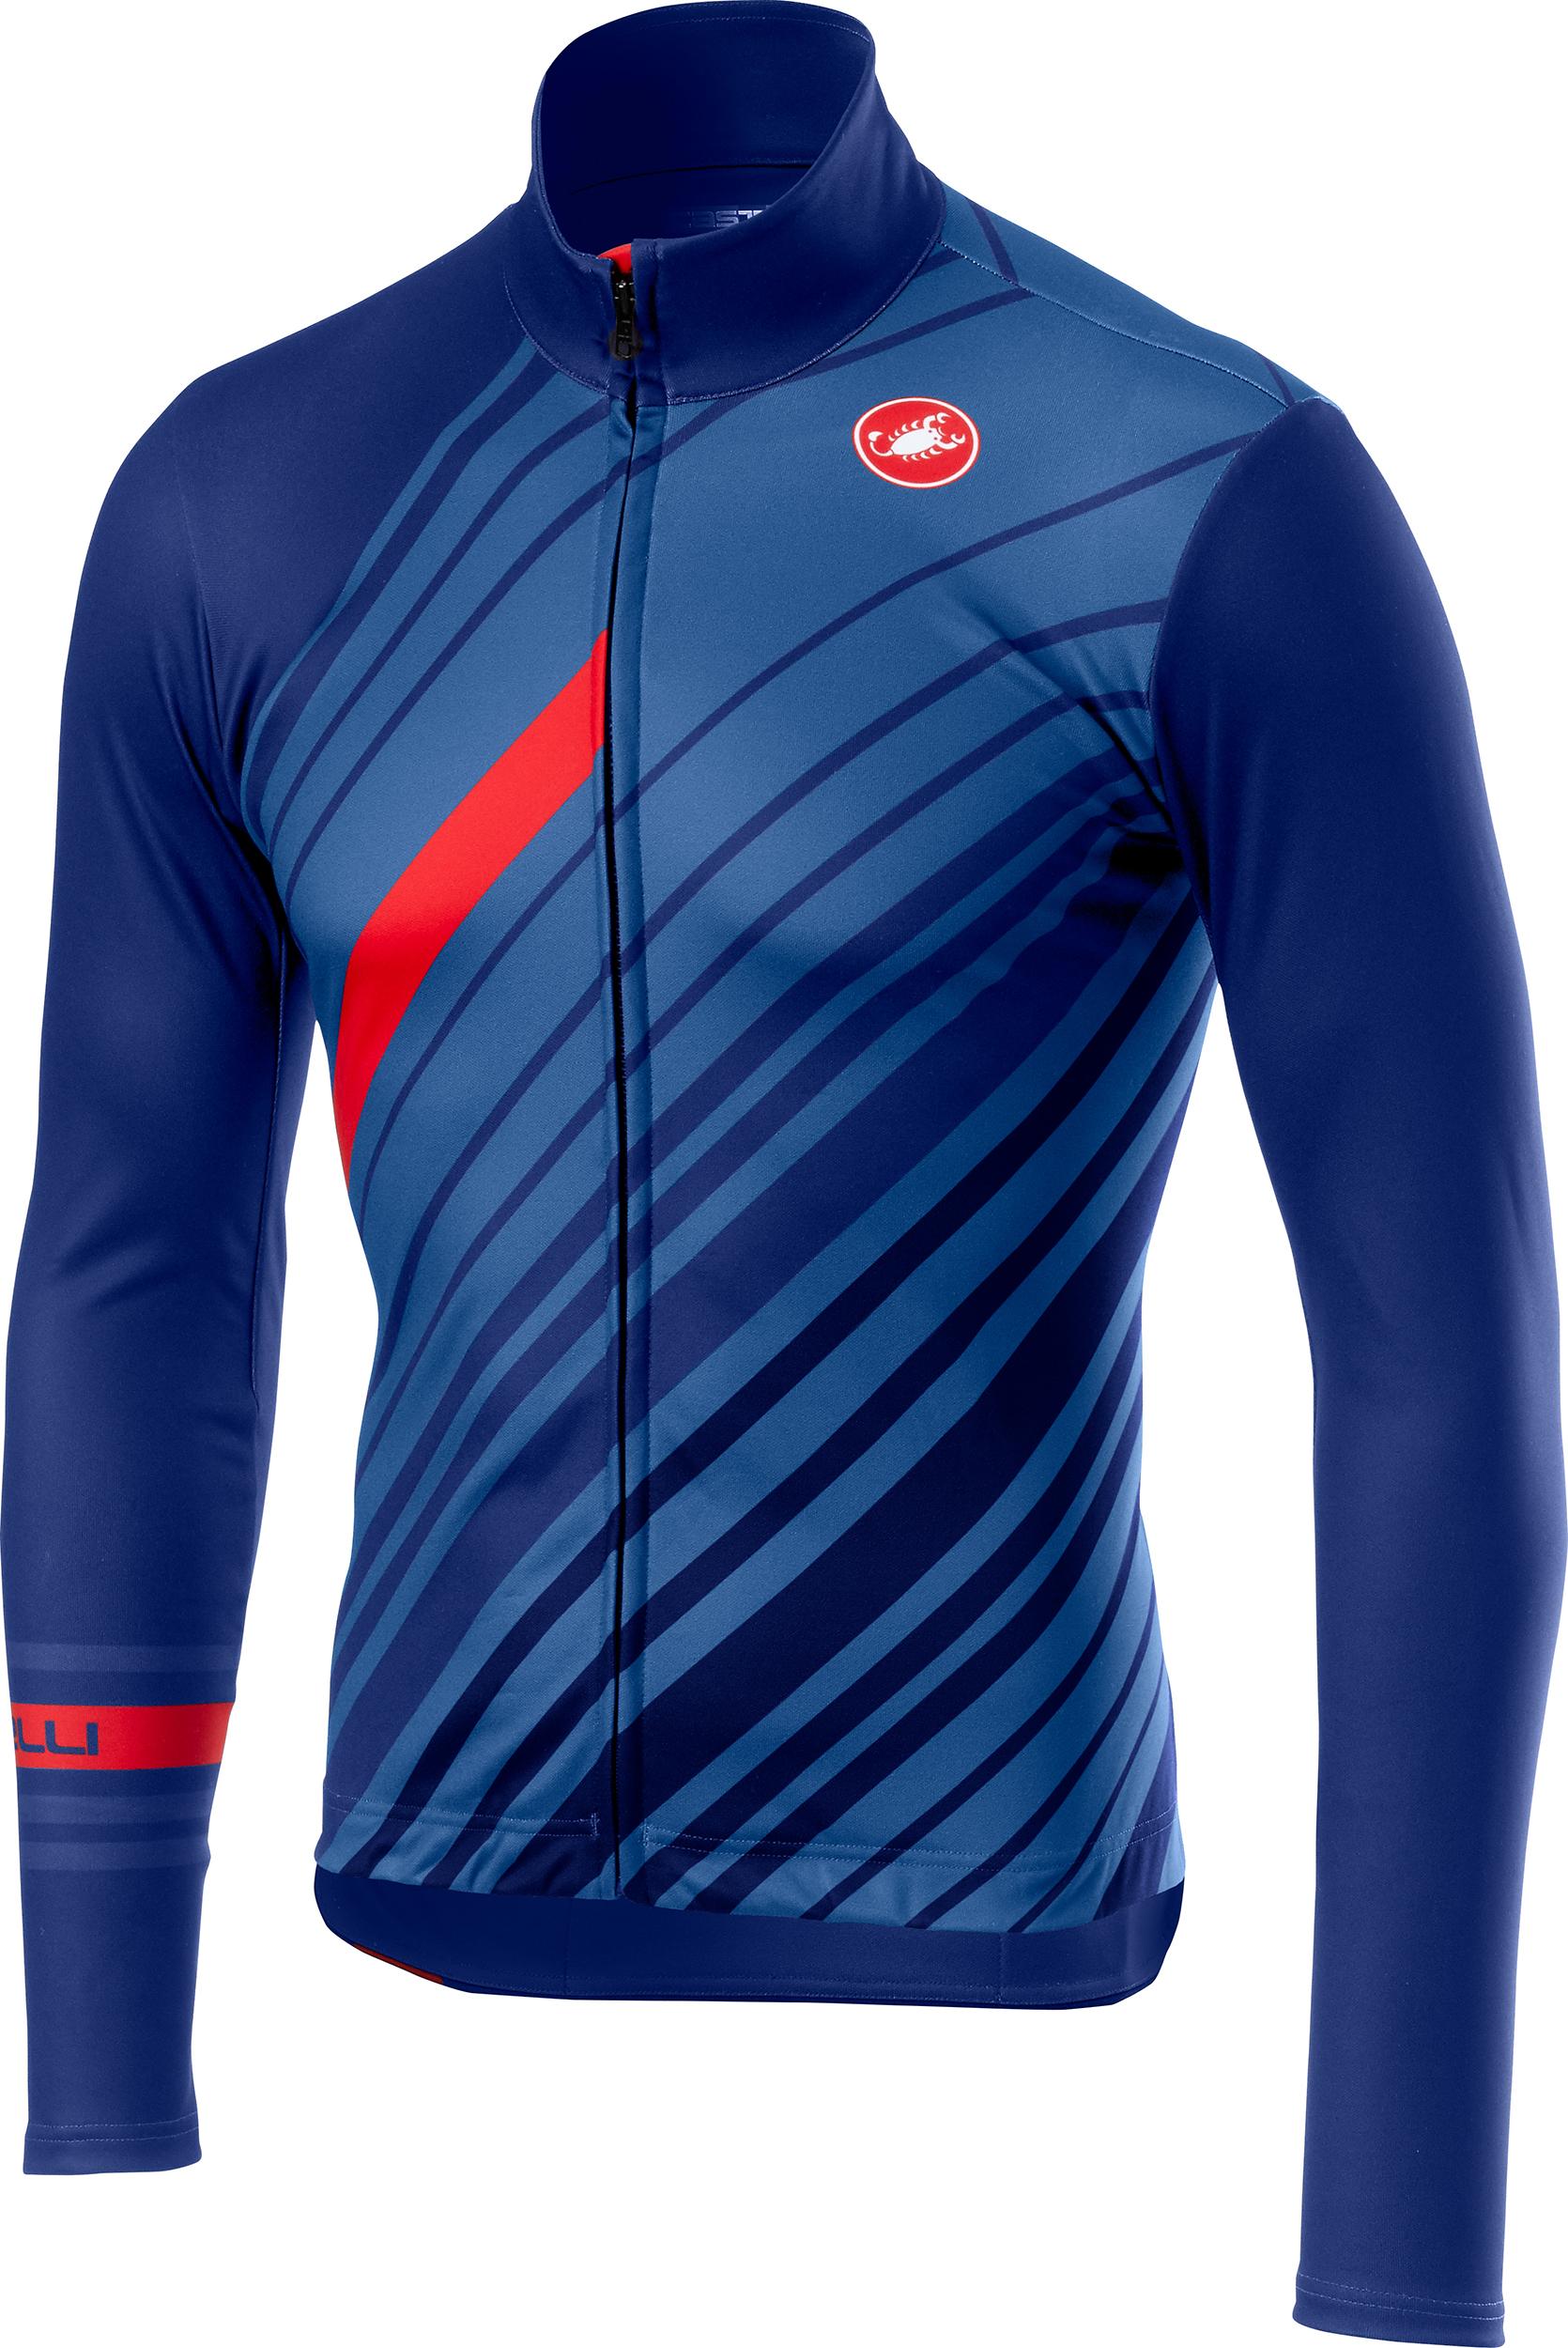 16ebbac0eb5 Men s Cycling jerseys and shirts